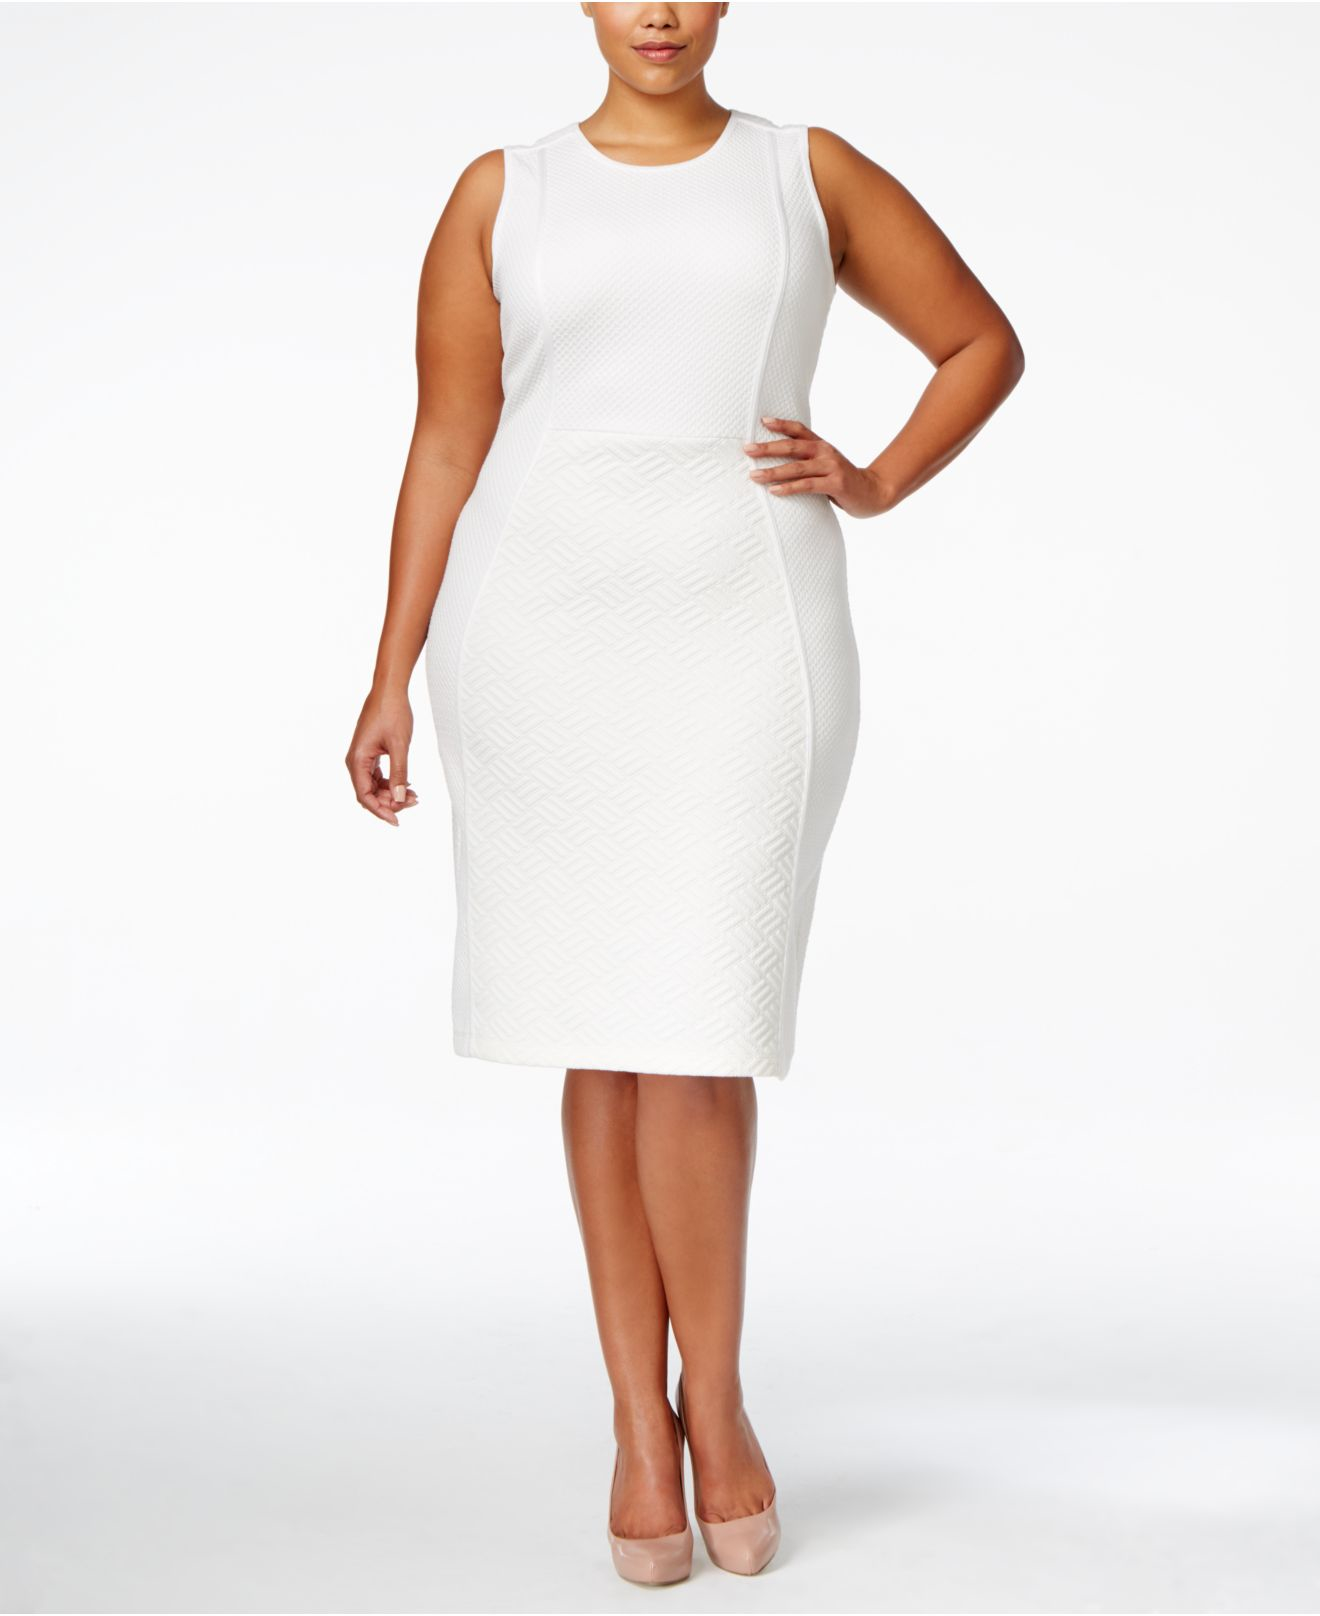 a12880153a2 Lyst Calvin Klein Plus Size Sleeveless Textured Knit Sheath Dress